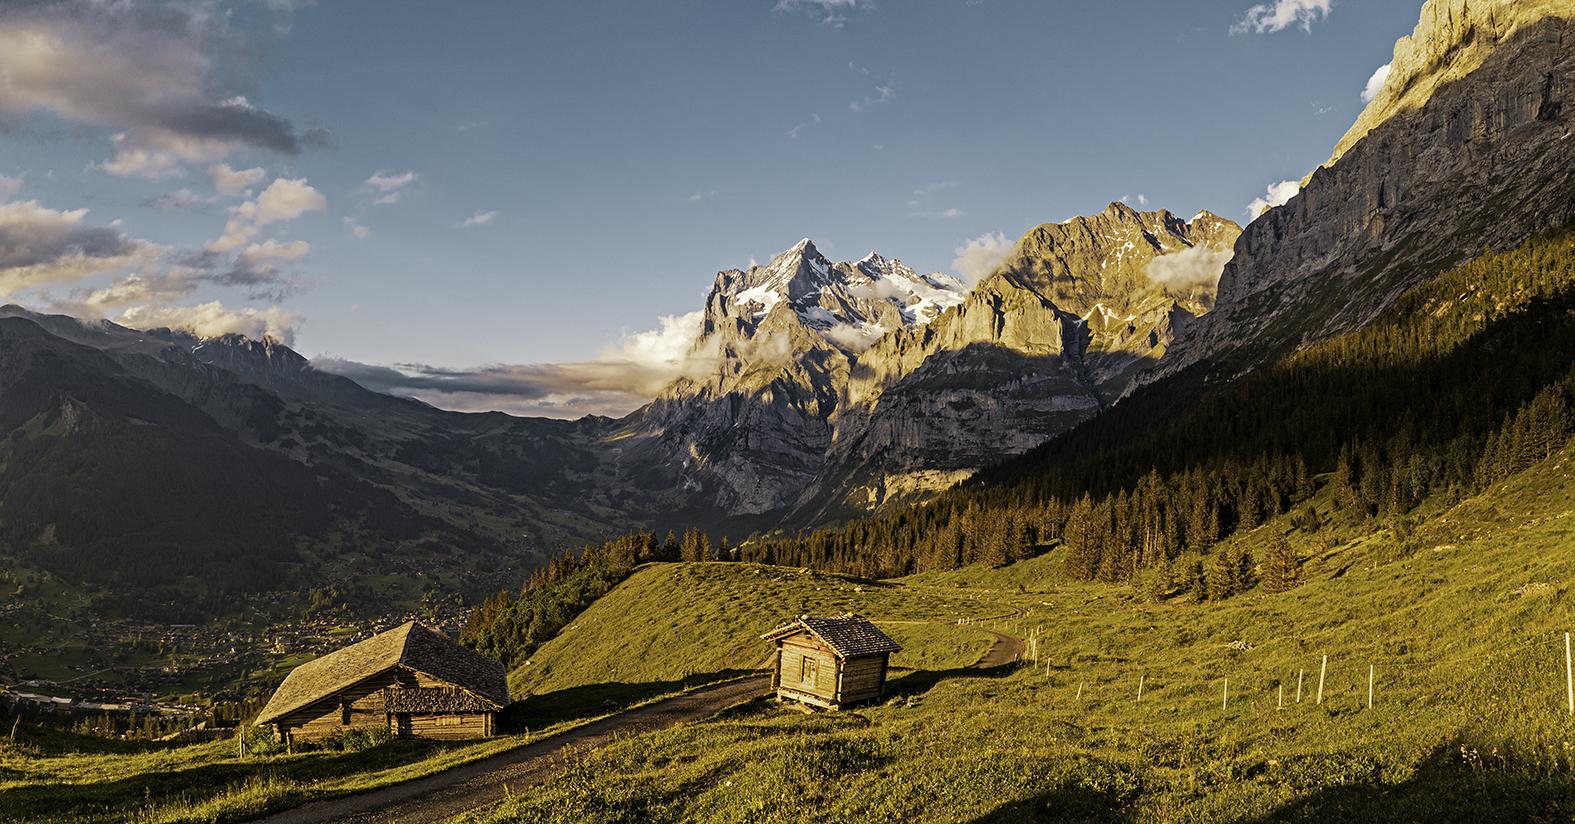 Eiger_Grindelwald3.jpg